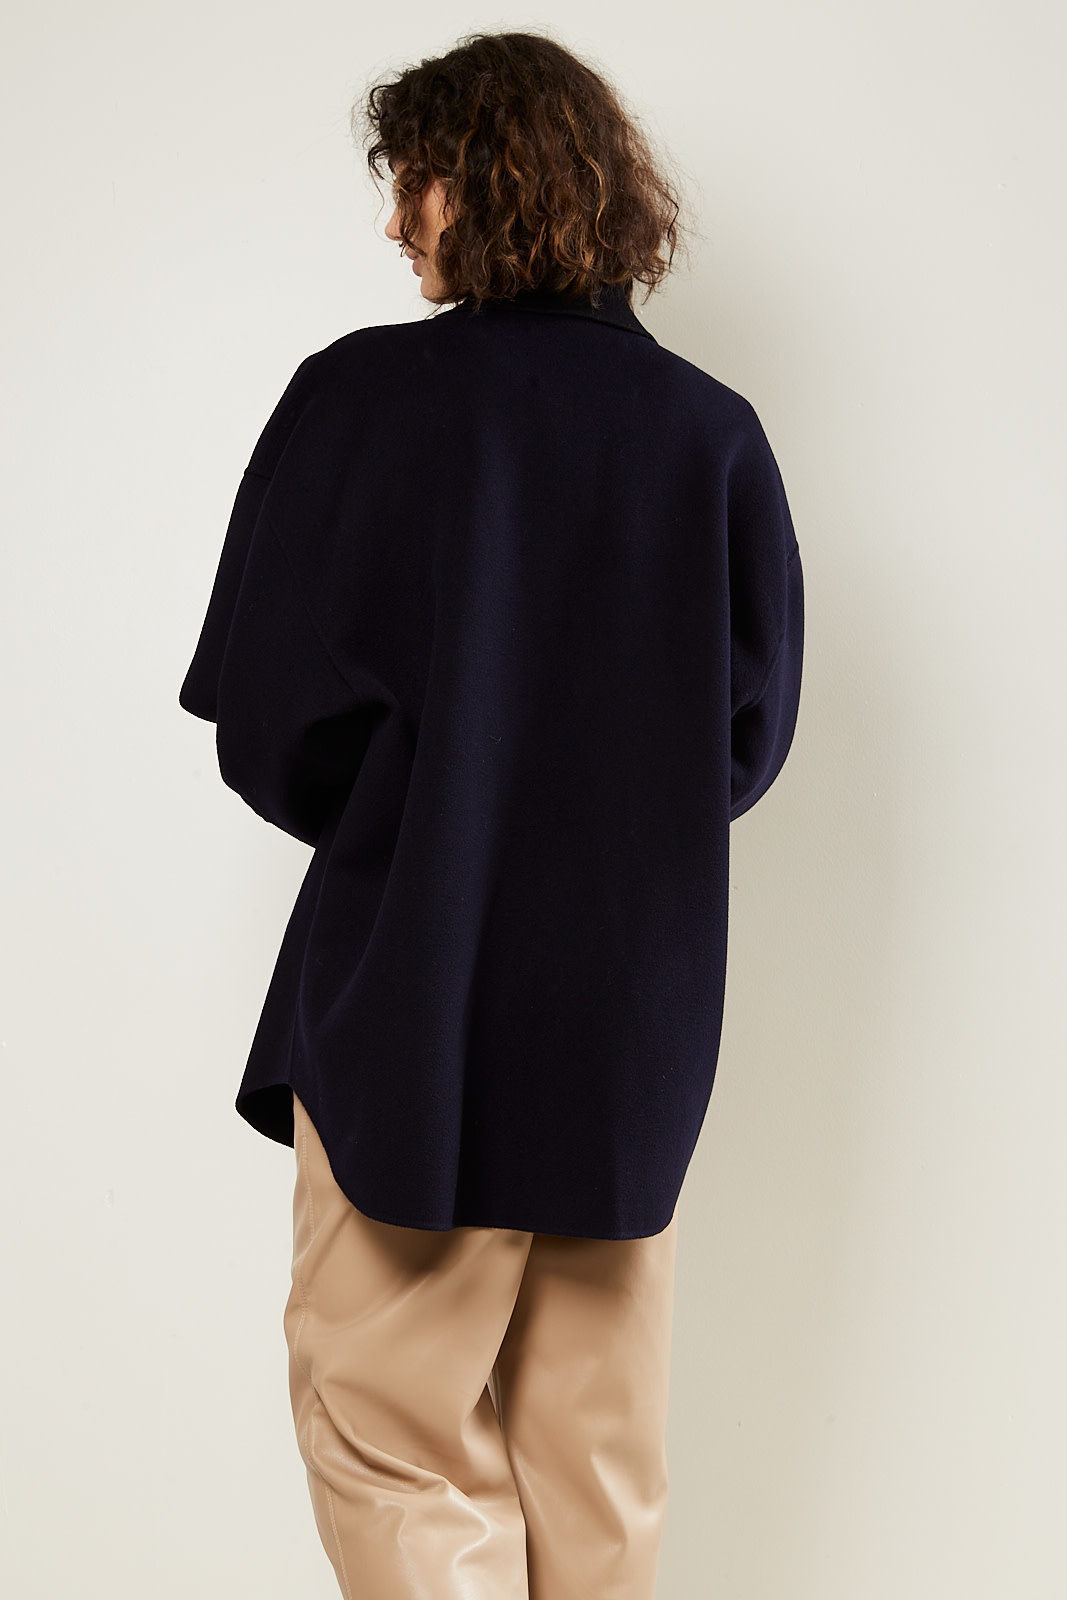 Nanushka - Martin double silk wool blend jacket